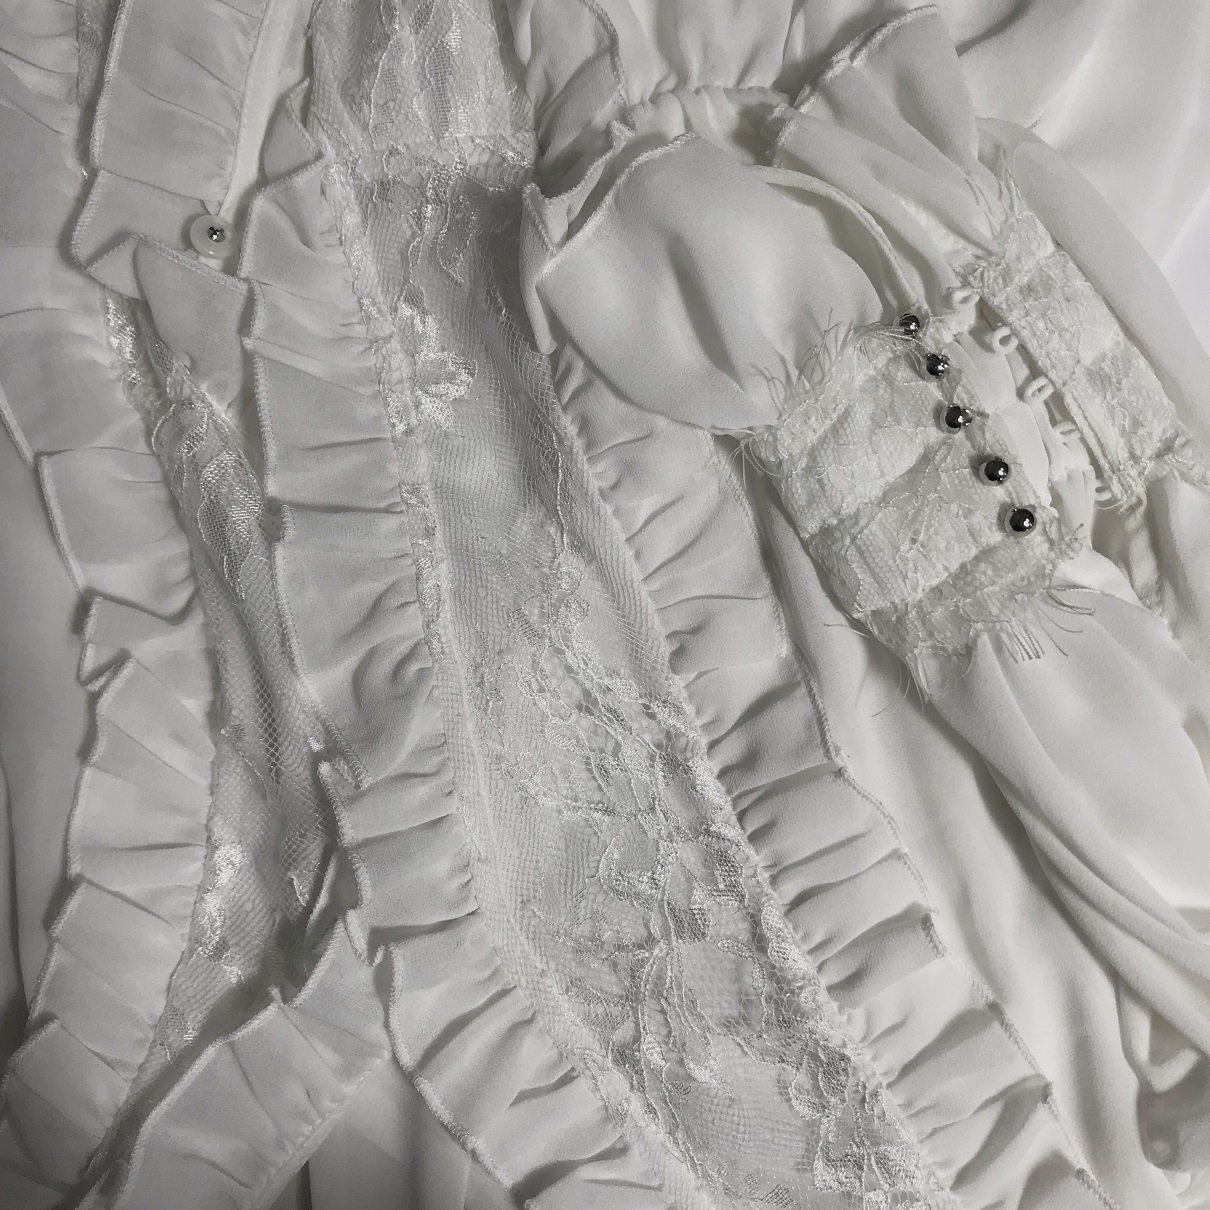 Frauen sommer hohl out Shirts Fance stil mit langen ärmeln elegante spitze Hemd Tops A292 - 5